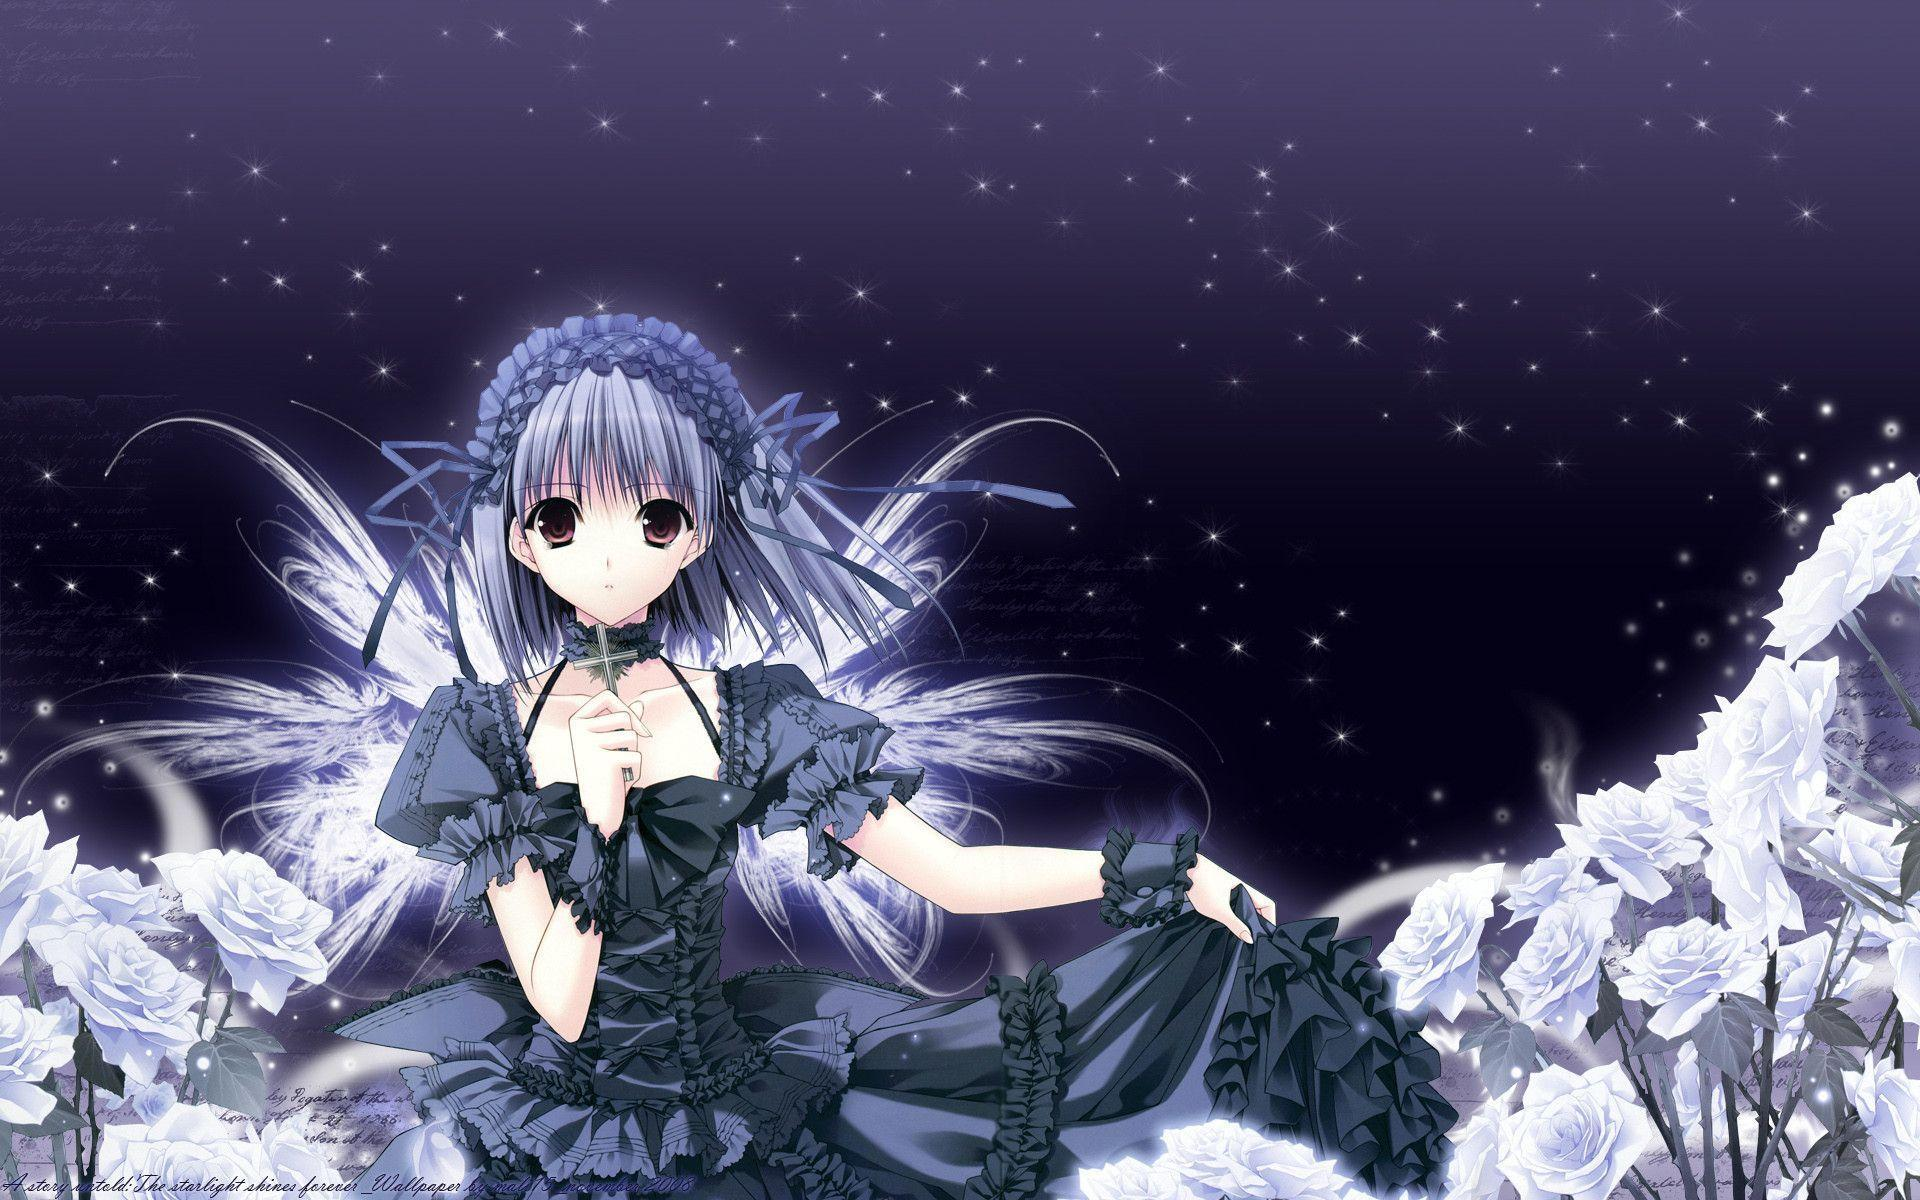 Anime angel wallpapers wallpaper cave - Dark angel anime wallpaper ...